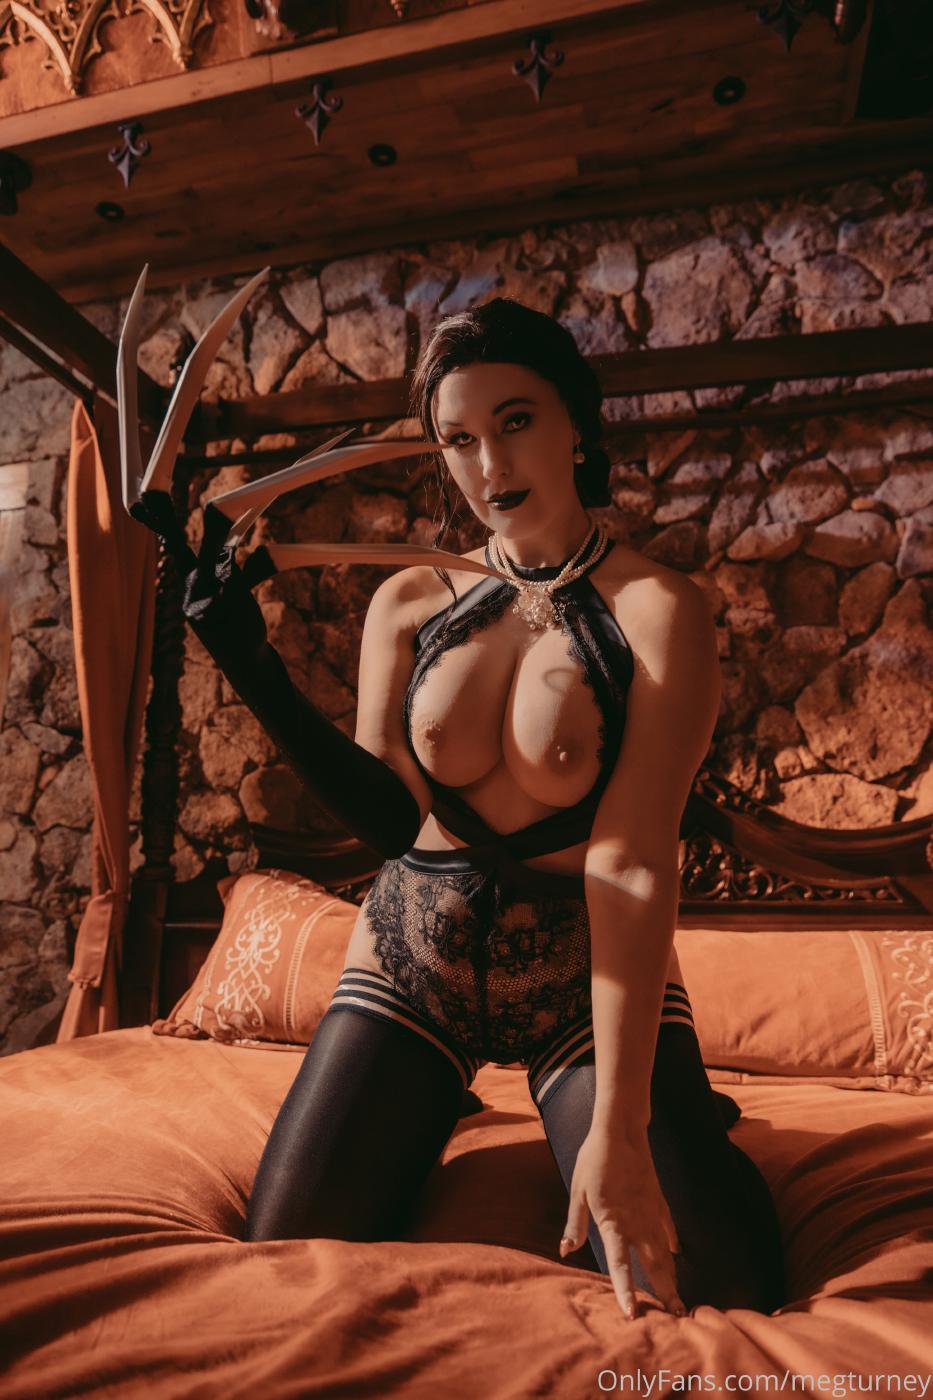 Meg Turney Lady Dimitrescu Cosplay Onlyfans Set Leaked 0052